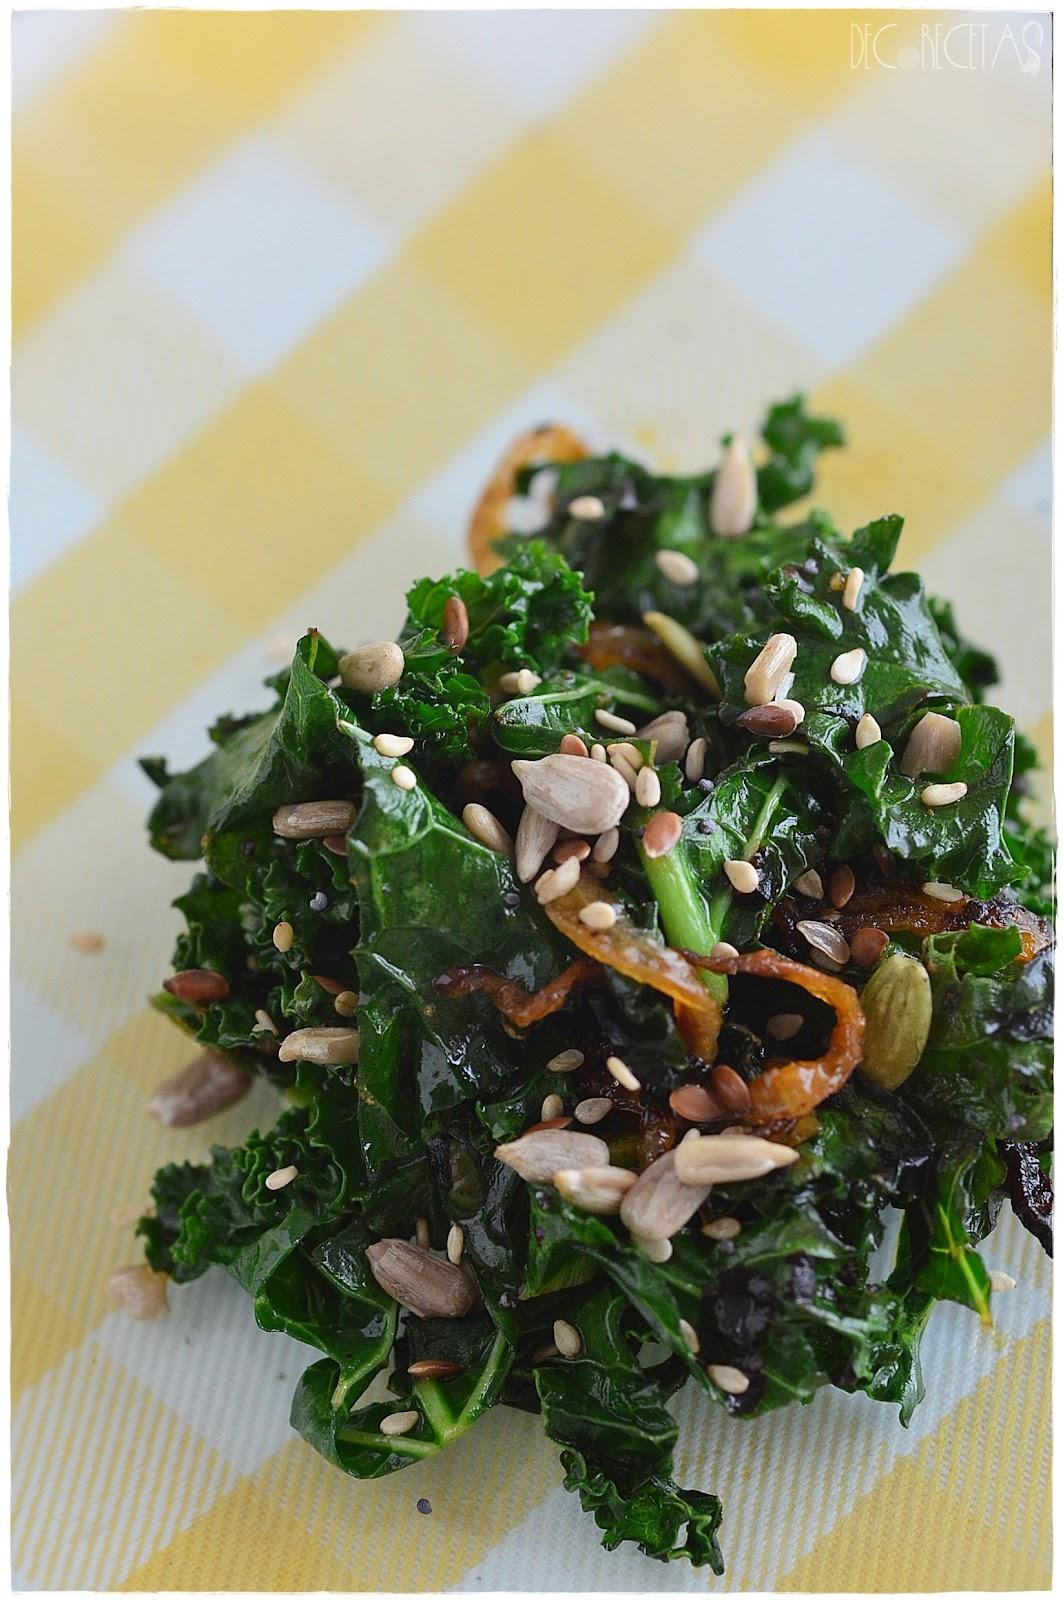 Kale salteada con semillas | DECORECETAS